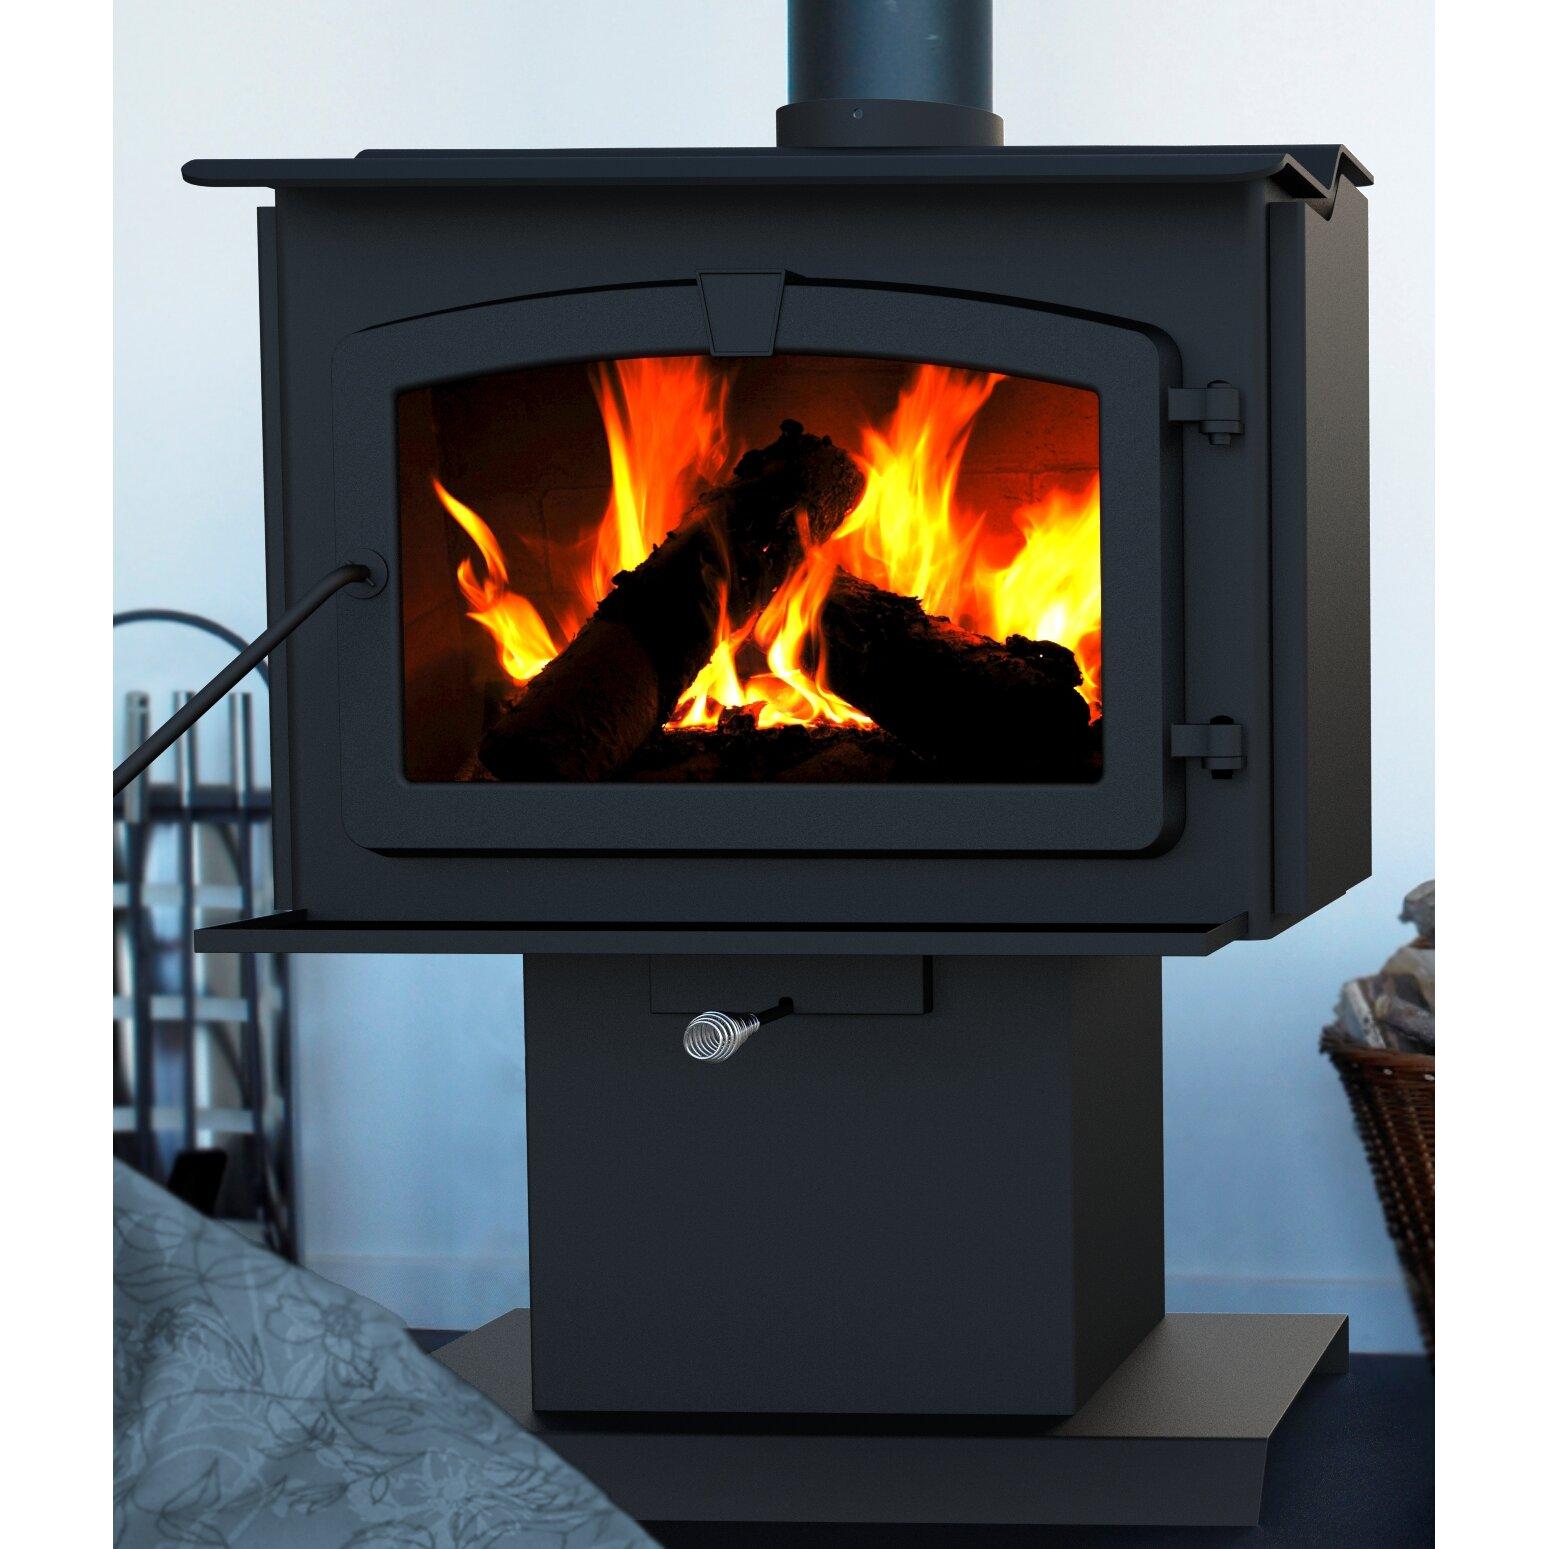 Hearth Stove: Pleasant Hearth Wood Burning Stove & Reviews